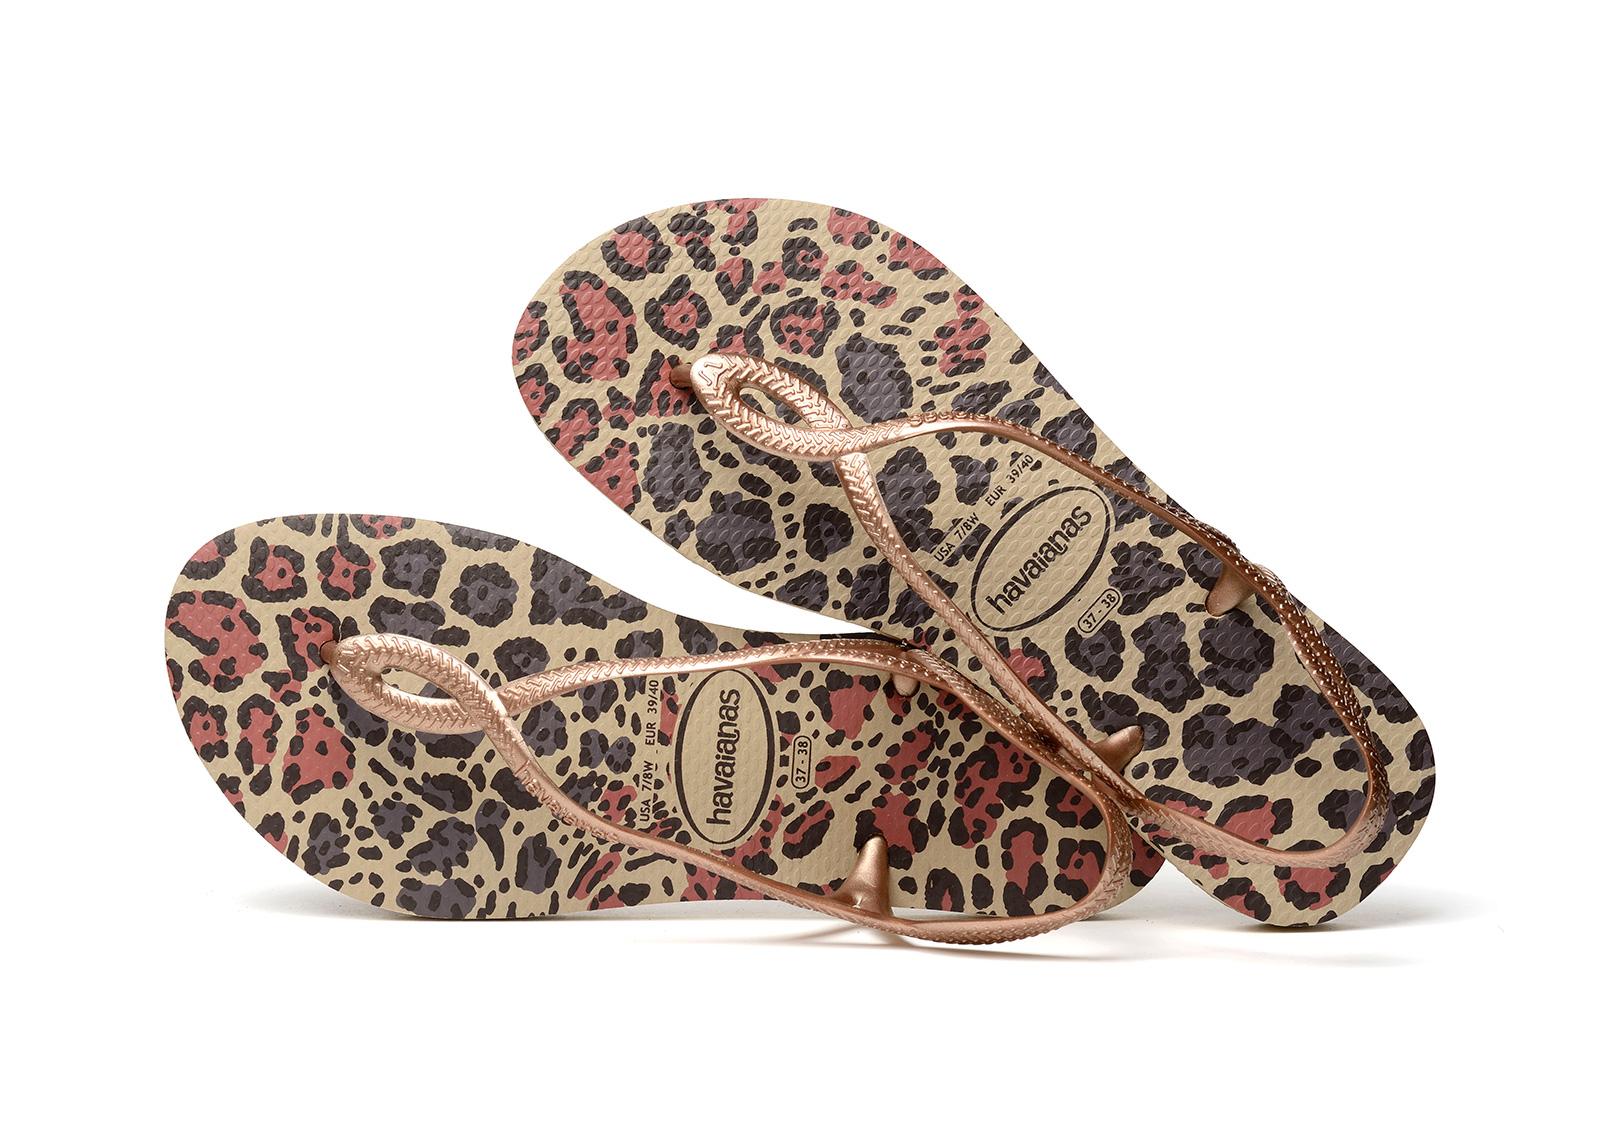 7273d4e12a16 Sandals Flip-flops - Havaianas Luna Animals Sand Grey rose Gold